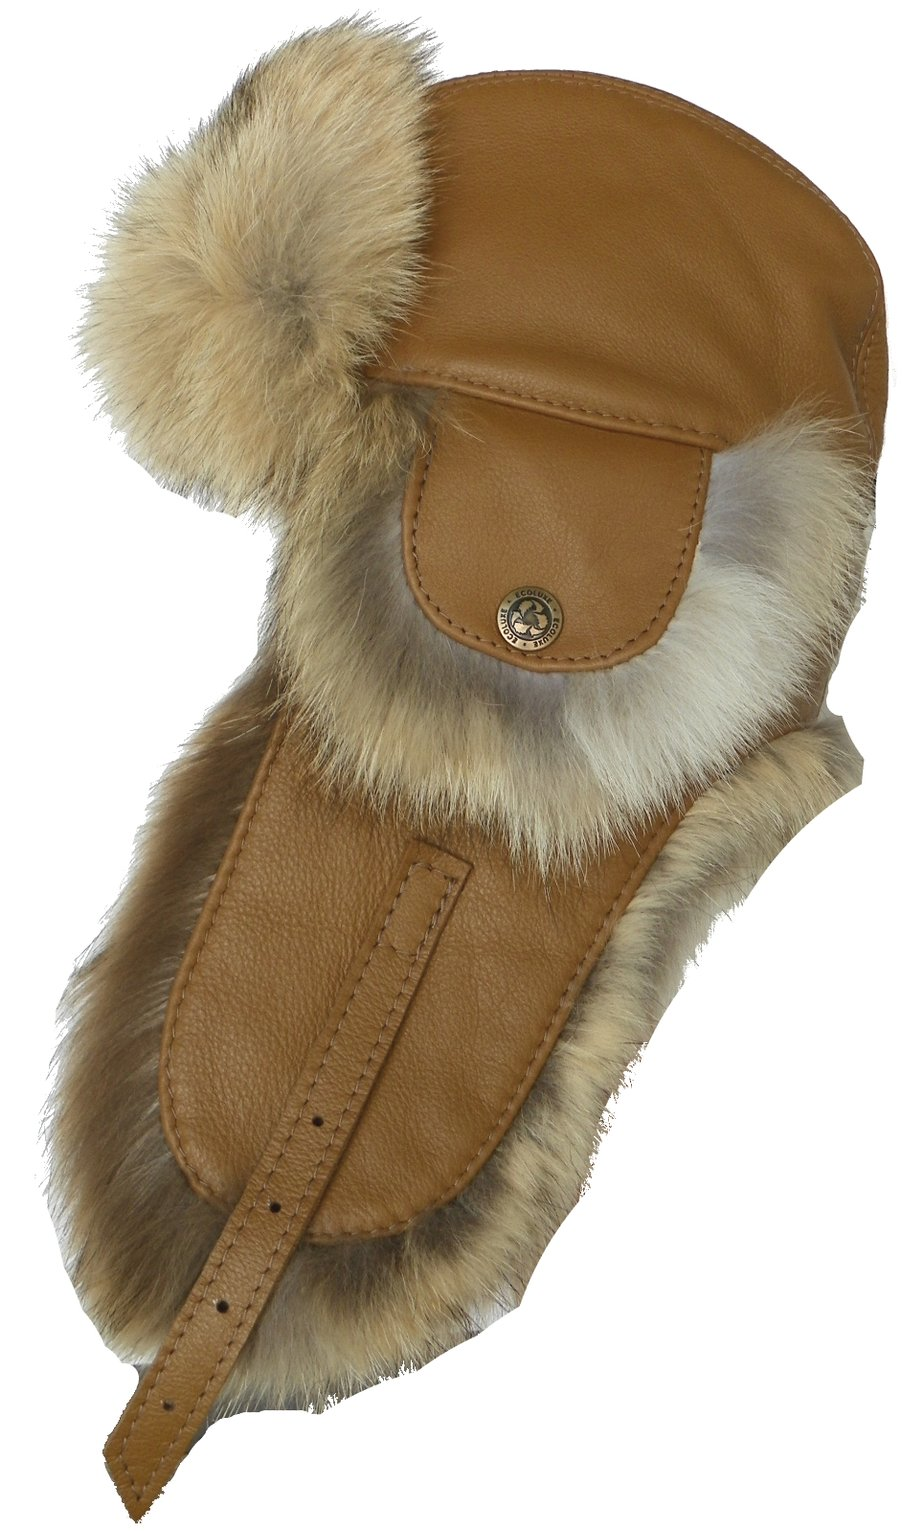 Harricana Recycled Coyote Fur & Leather Trooper Hat Deluxe Aviator (Medium)